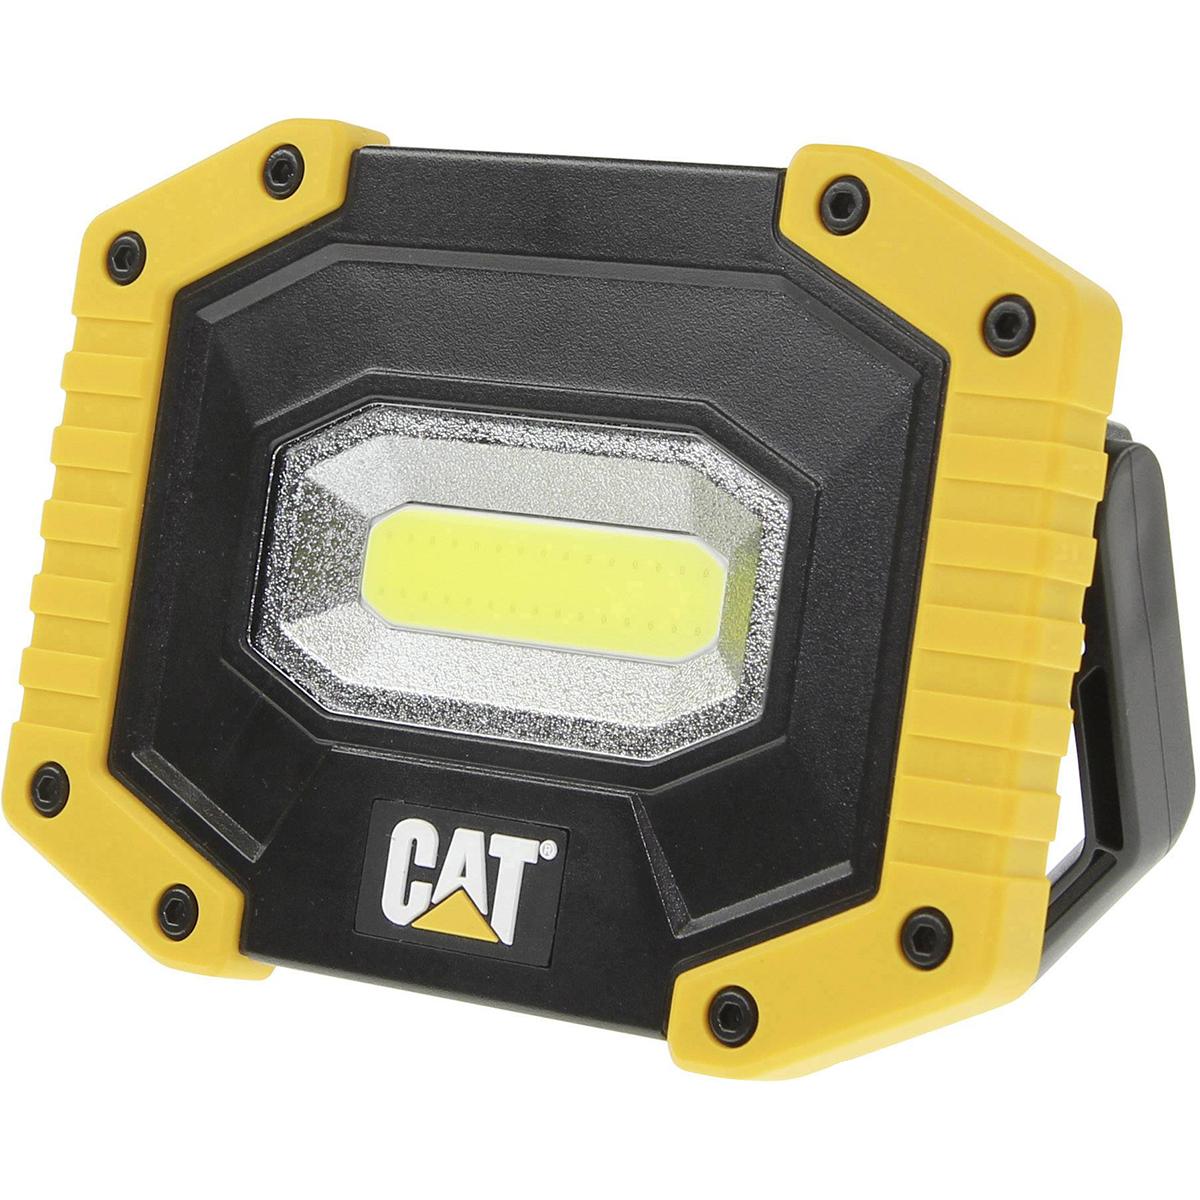 CAT RECHARGEABLE LED WORK LIGHT 500 LUMEN